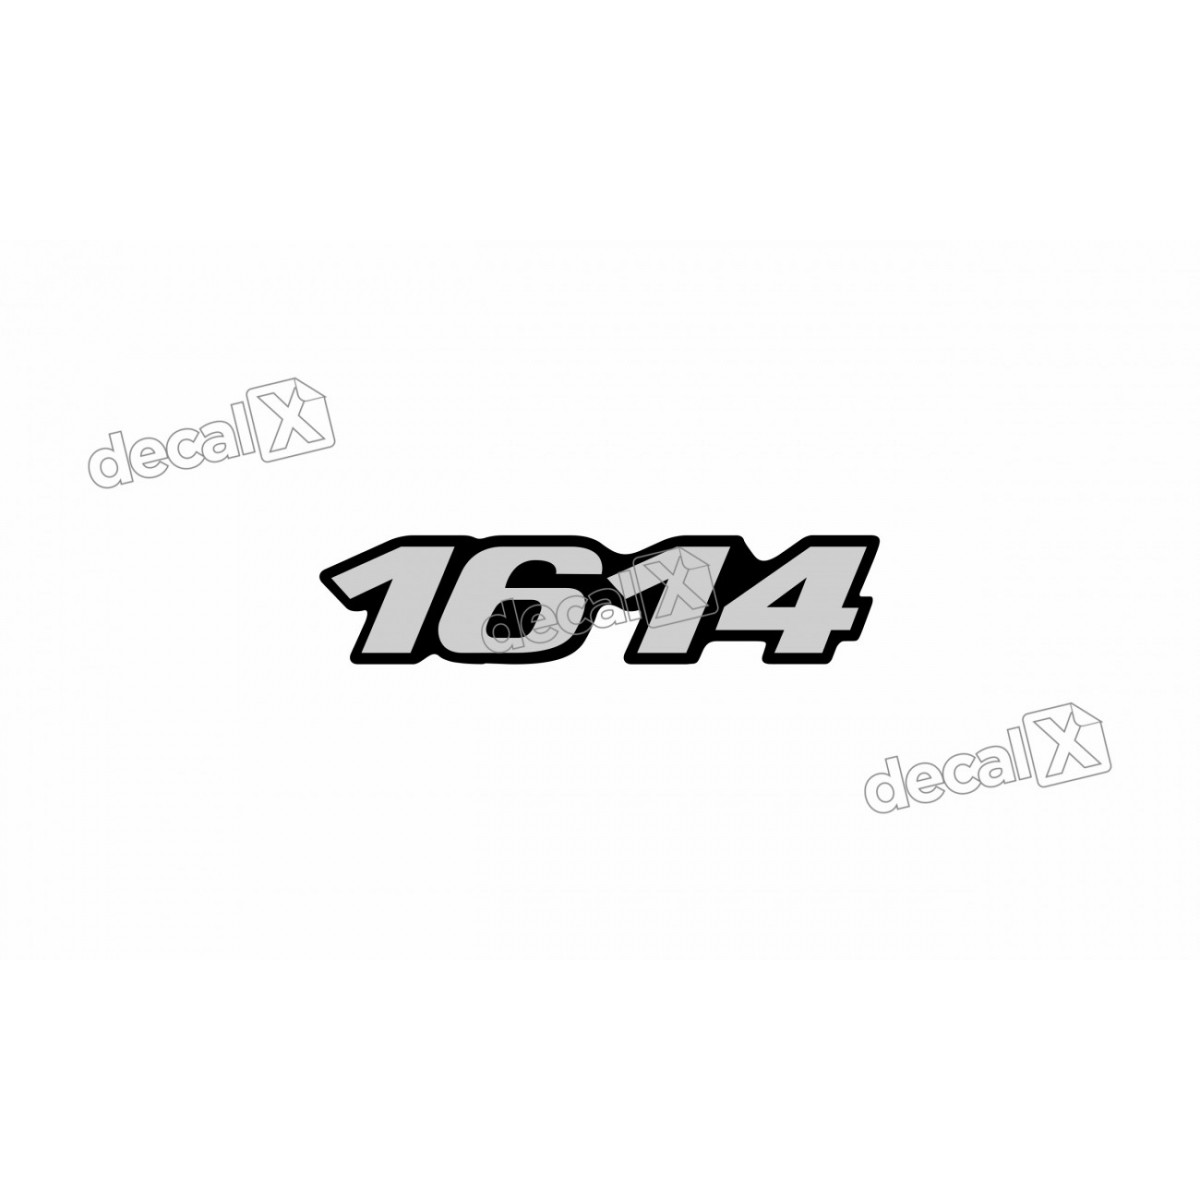 Adesivo Emblema Resinado Mercedes 1614 Cm42 Decalx